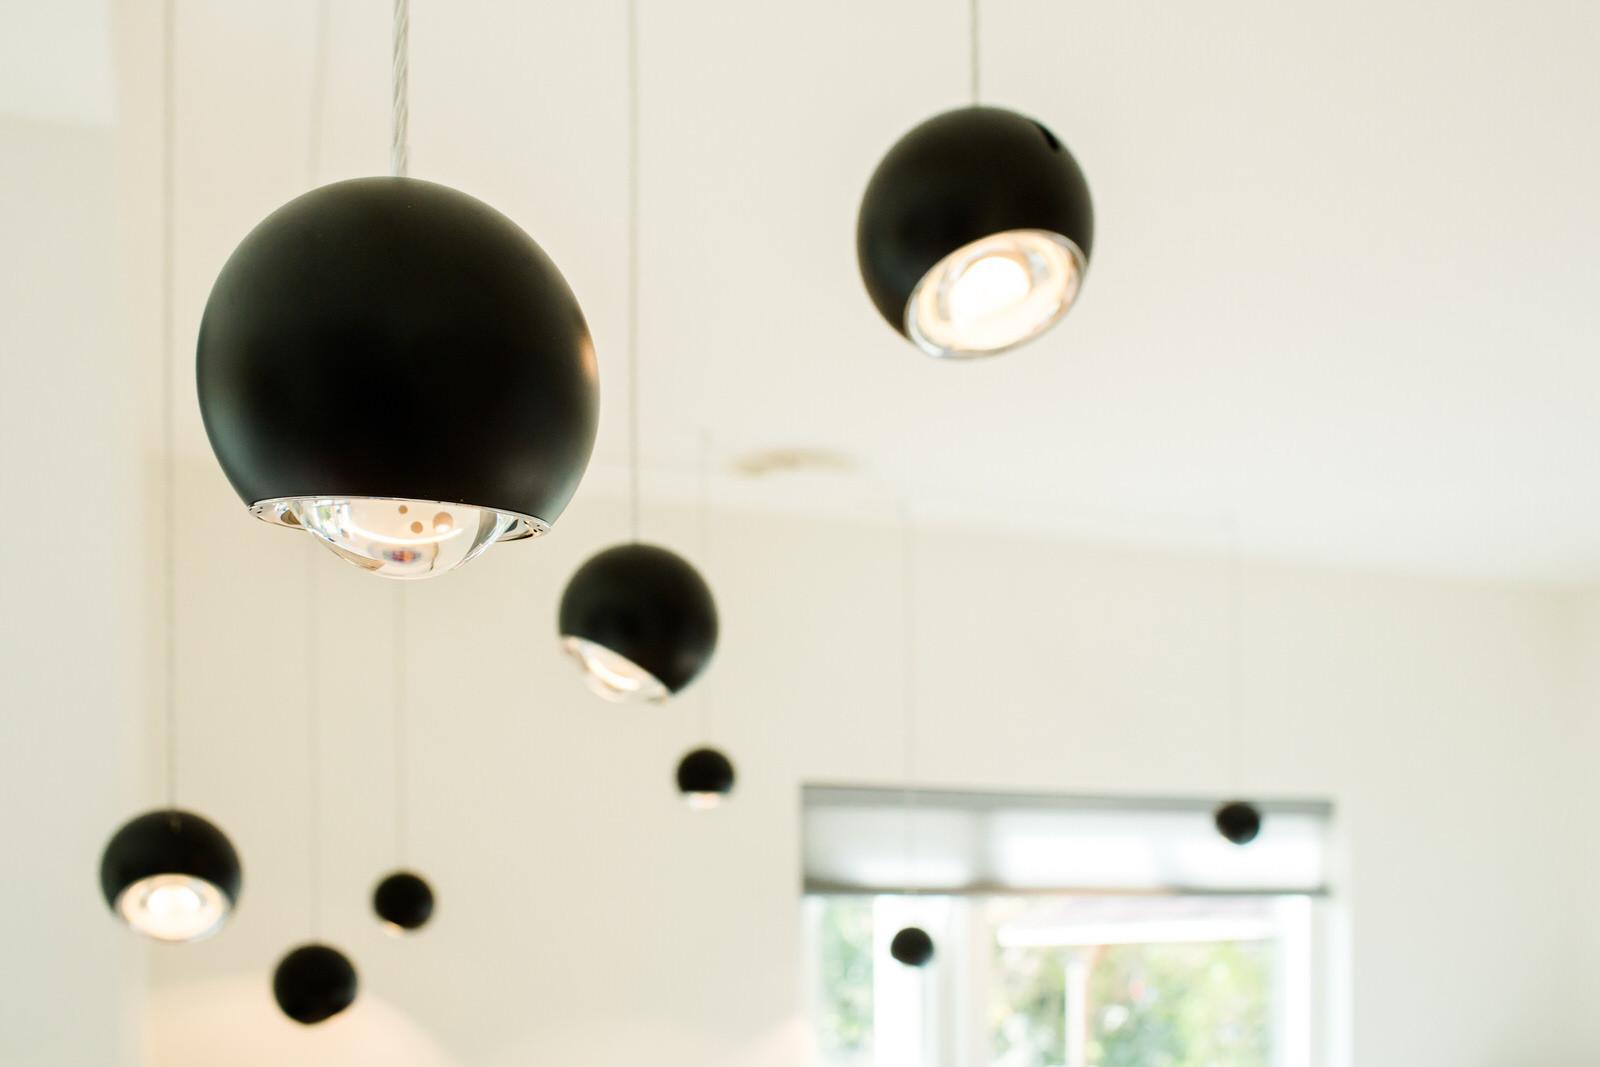 Awesome Bosch Verlichting Harderwijk Pictures - Trend Ideas 2018 ...